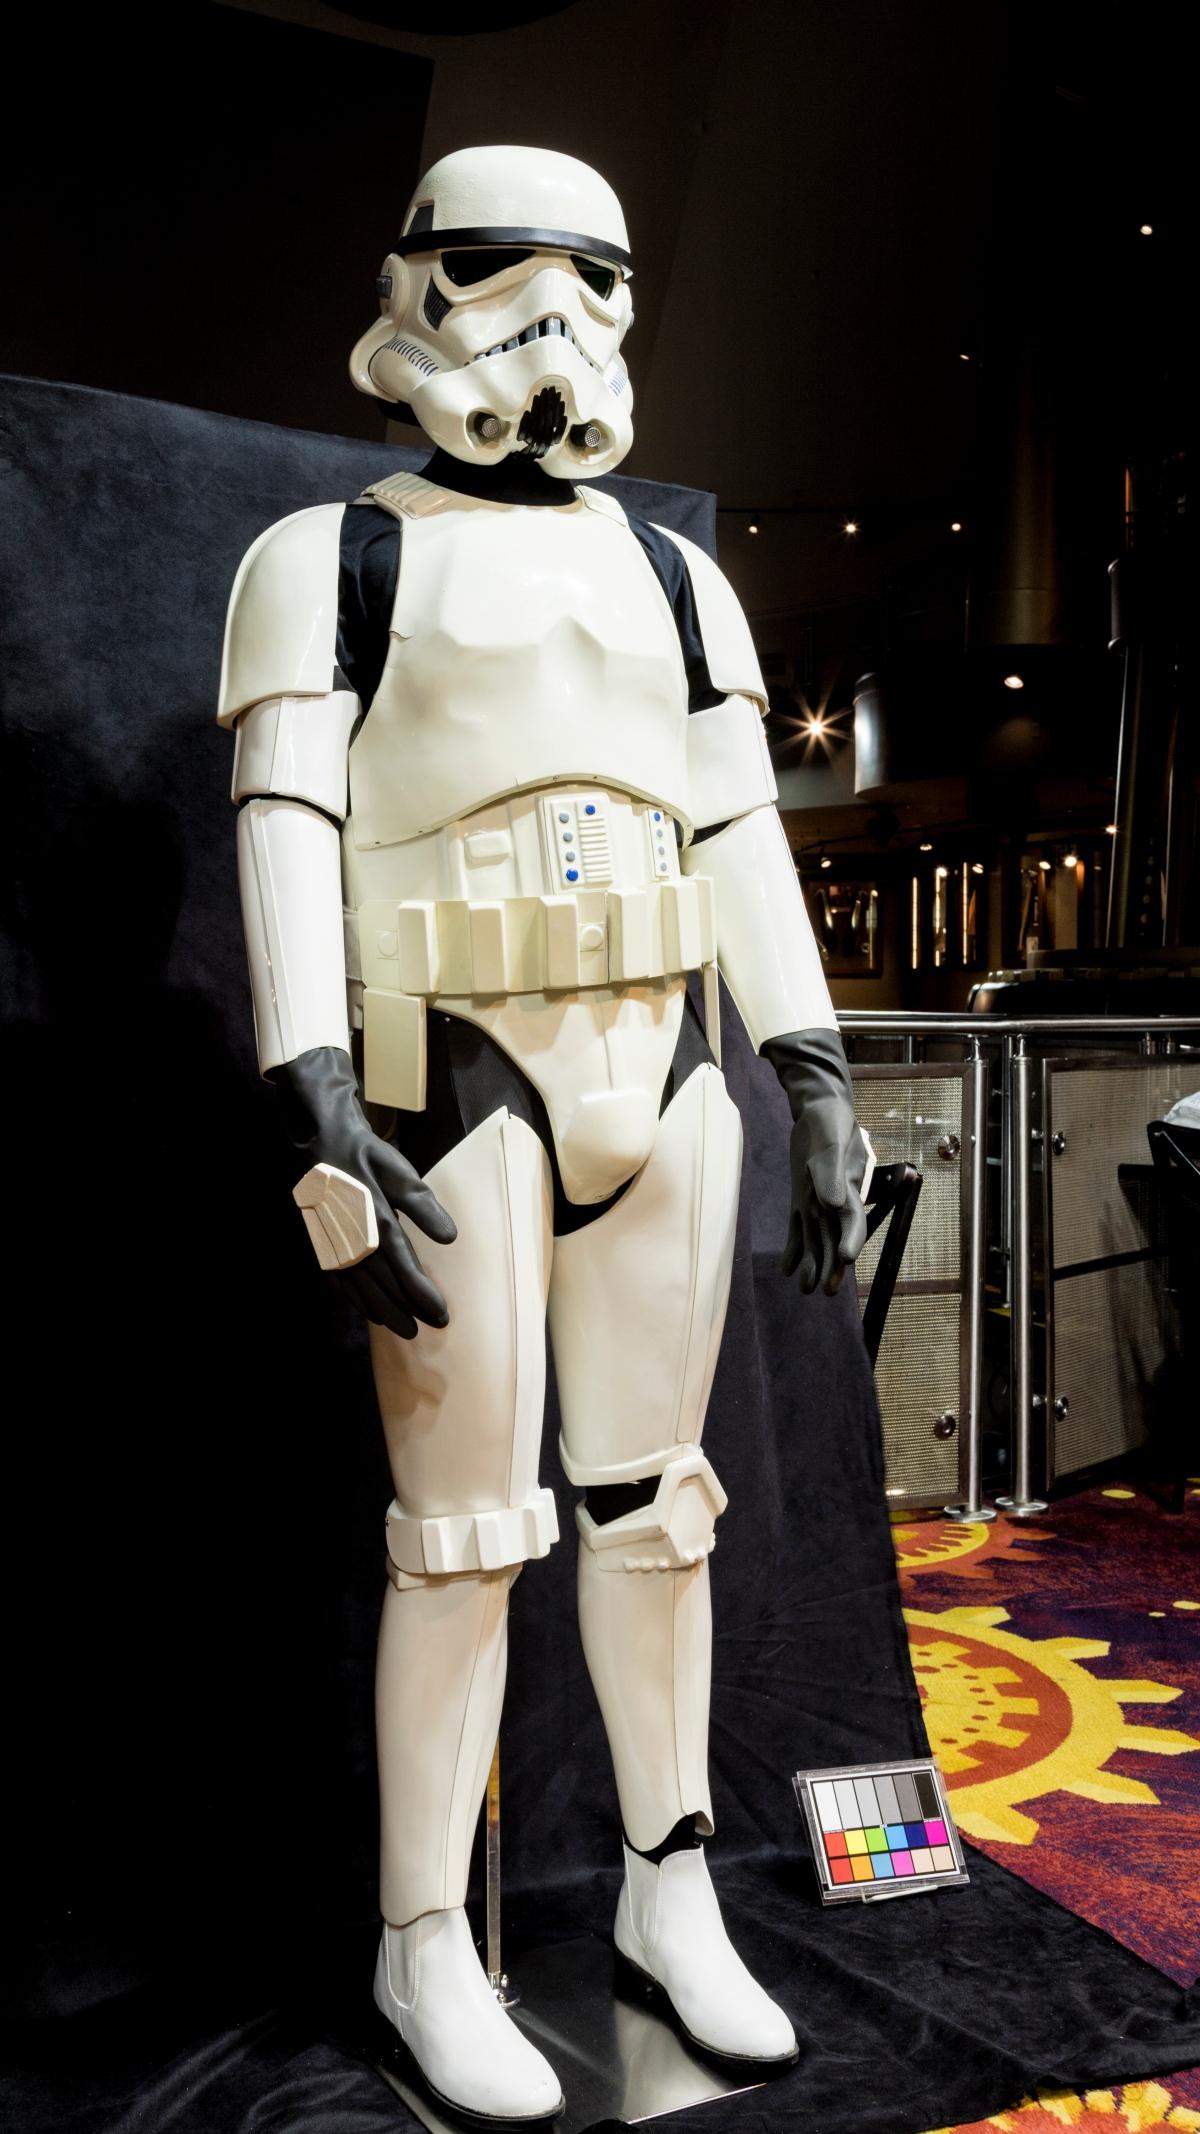 Stormtooper to Orlando